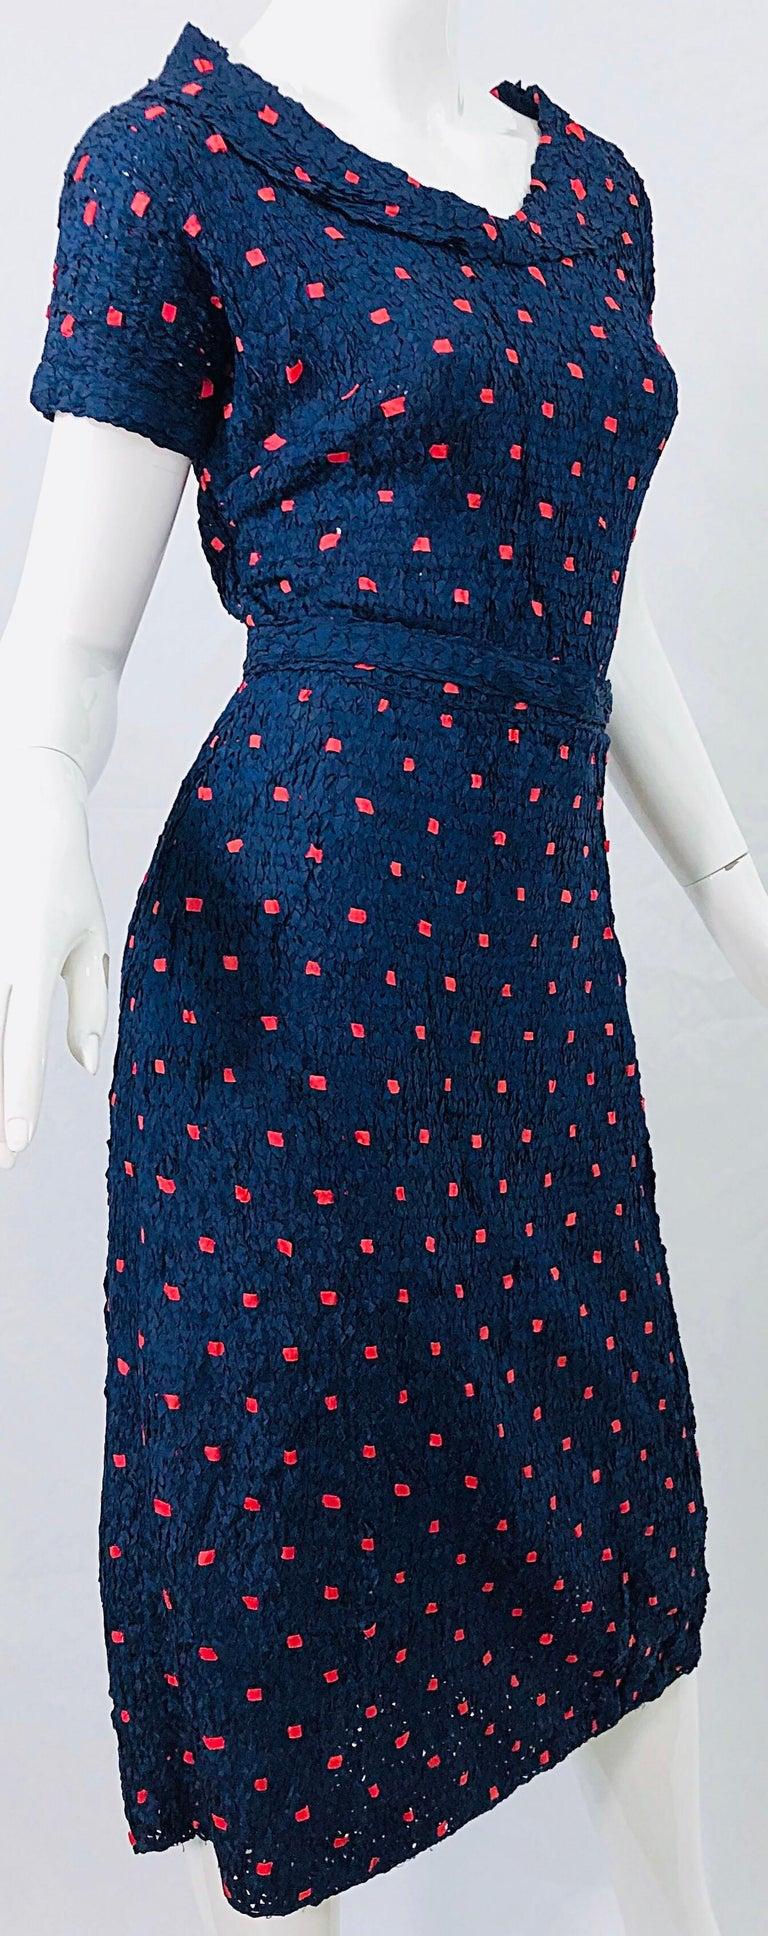 1950s Ann Fleischer for I Magnin Hand Ribbon Knit Navy Blue + Red Vintage Dress For Sale 3